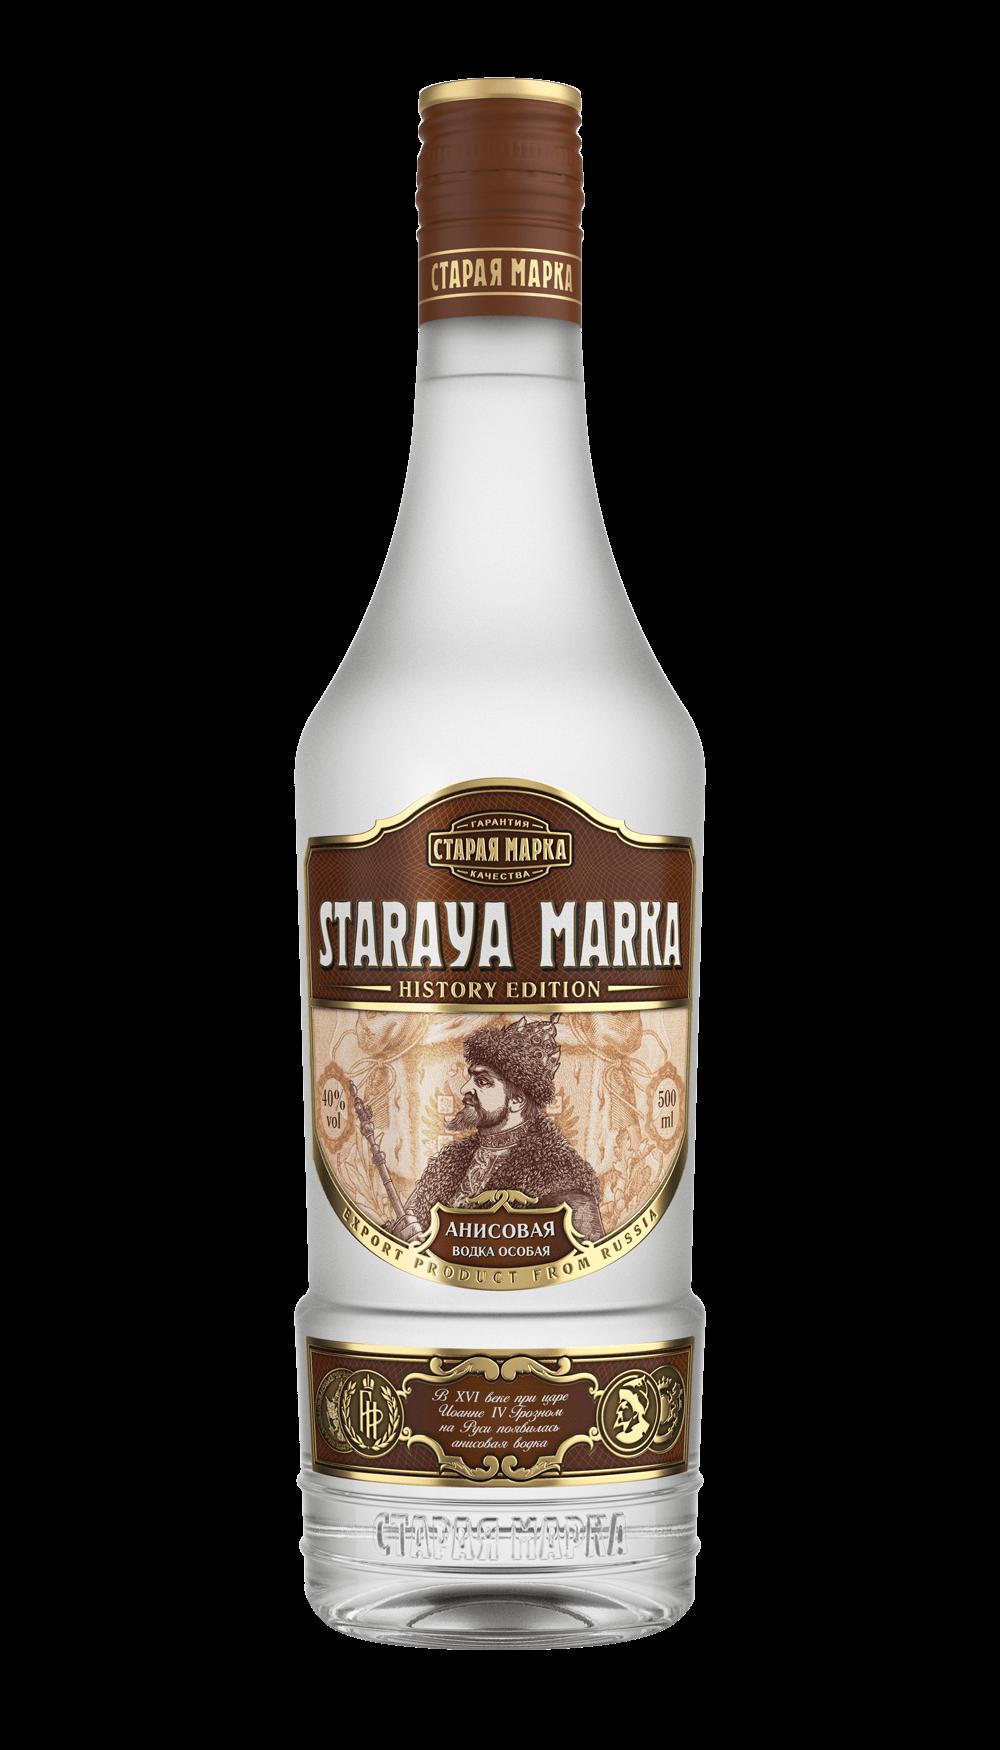 Drinking clipart vodka. Staraya marka transparent png